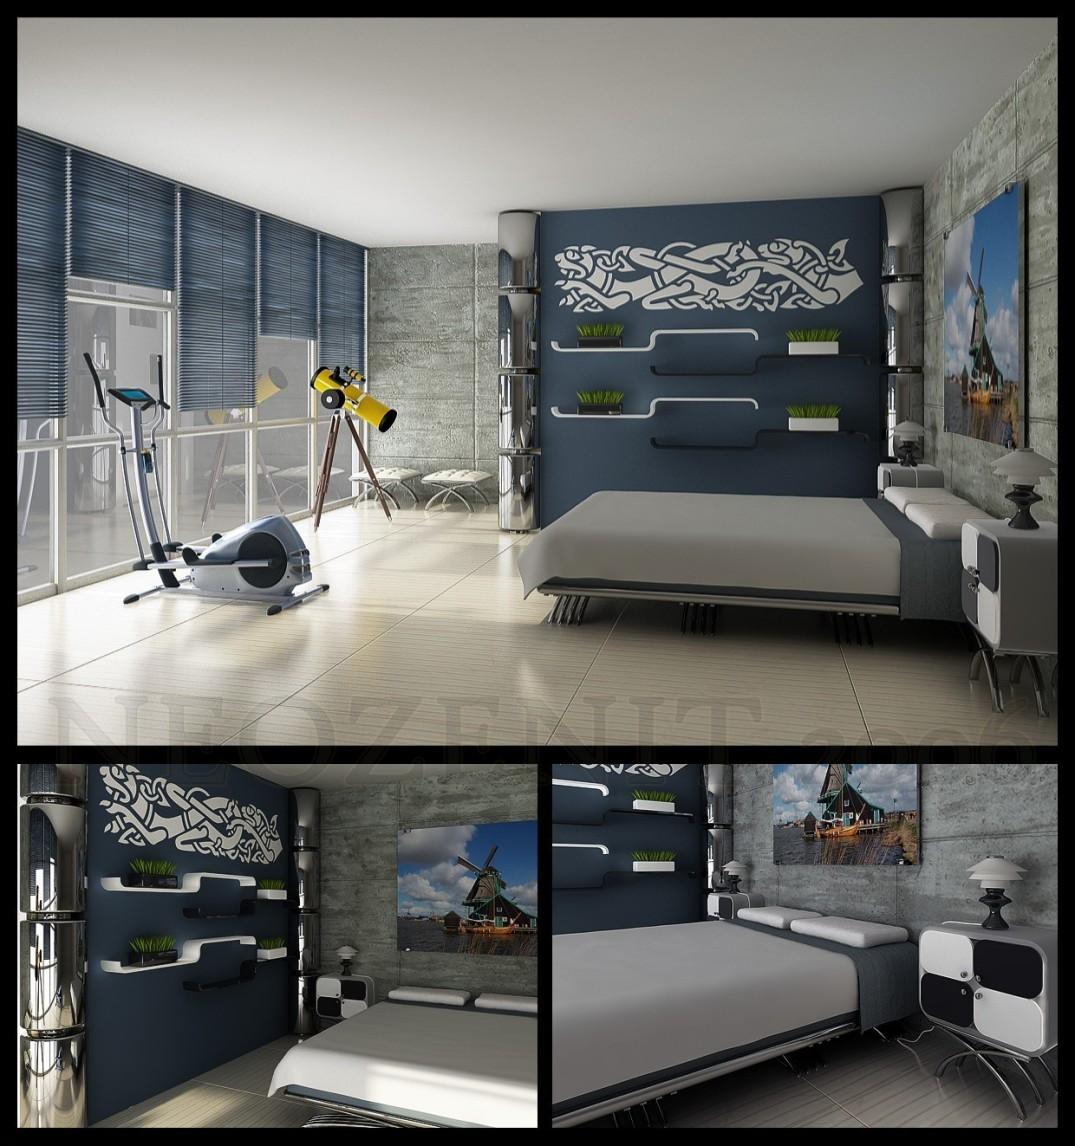 neozenit-room-for-a-friend-1-daba75a5-hktt